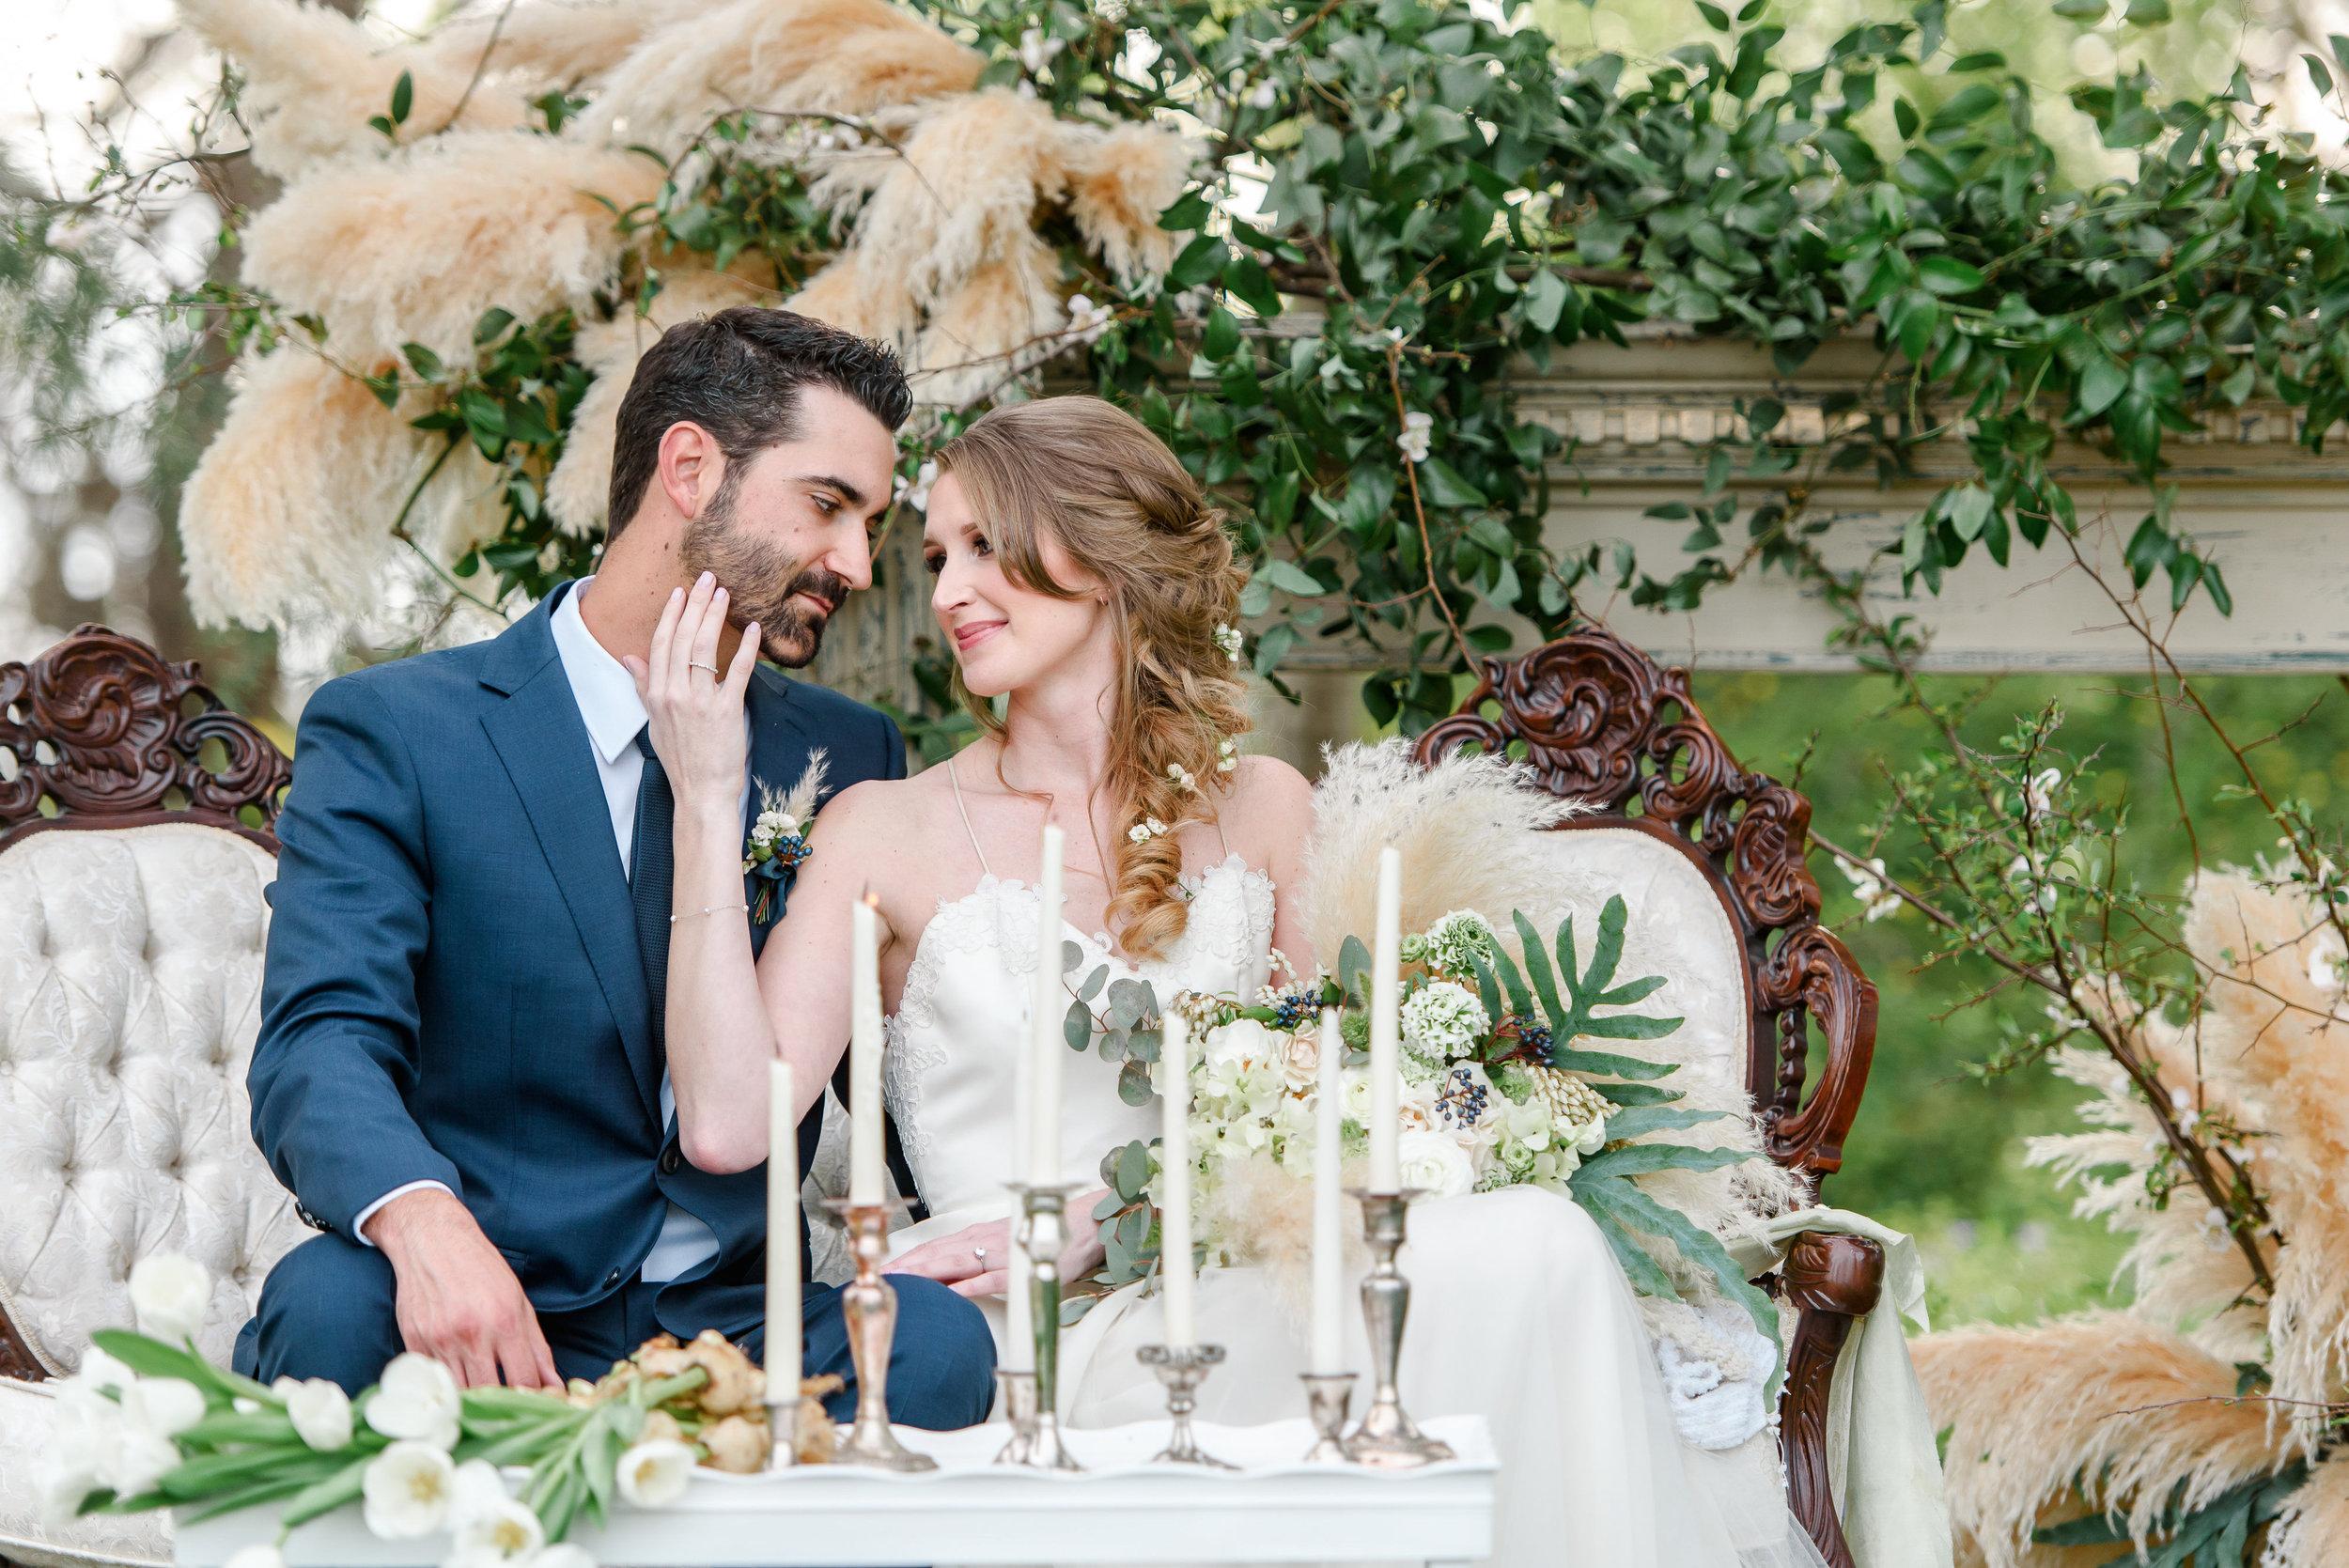 Garden Wedding Inspiration | Wedding Greenery